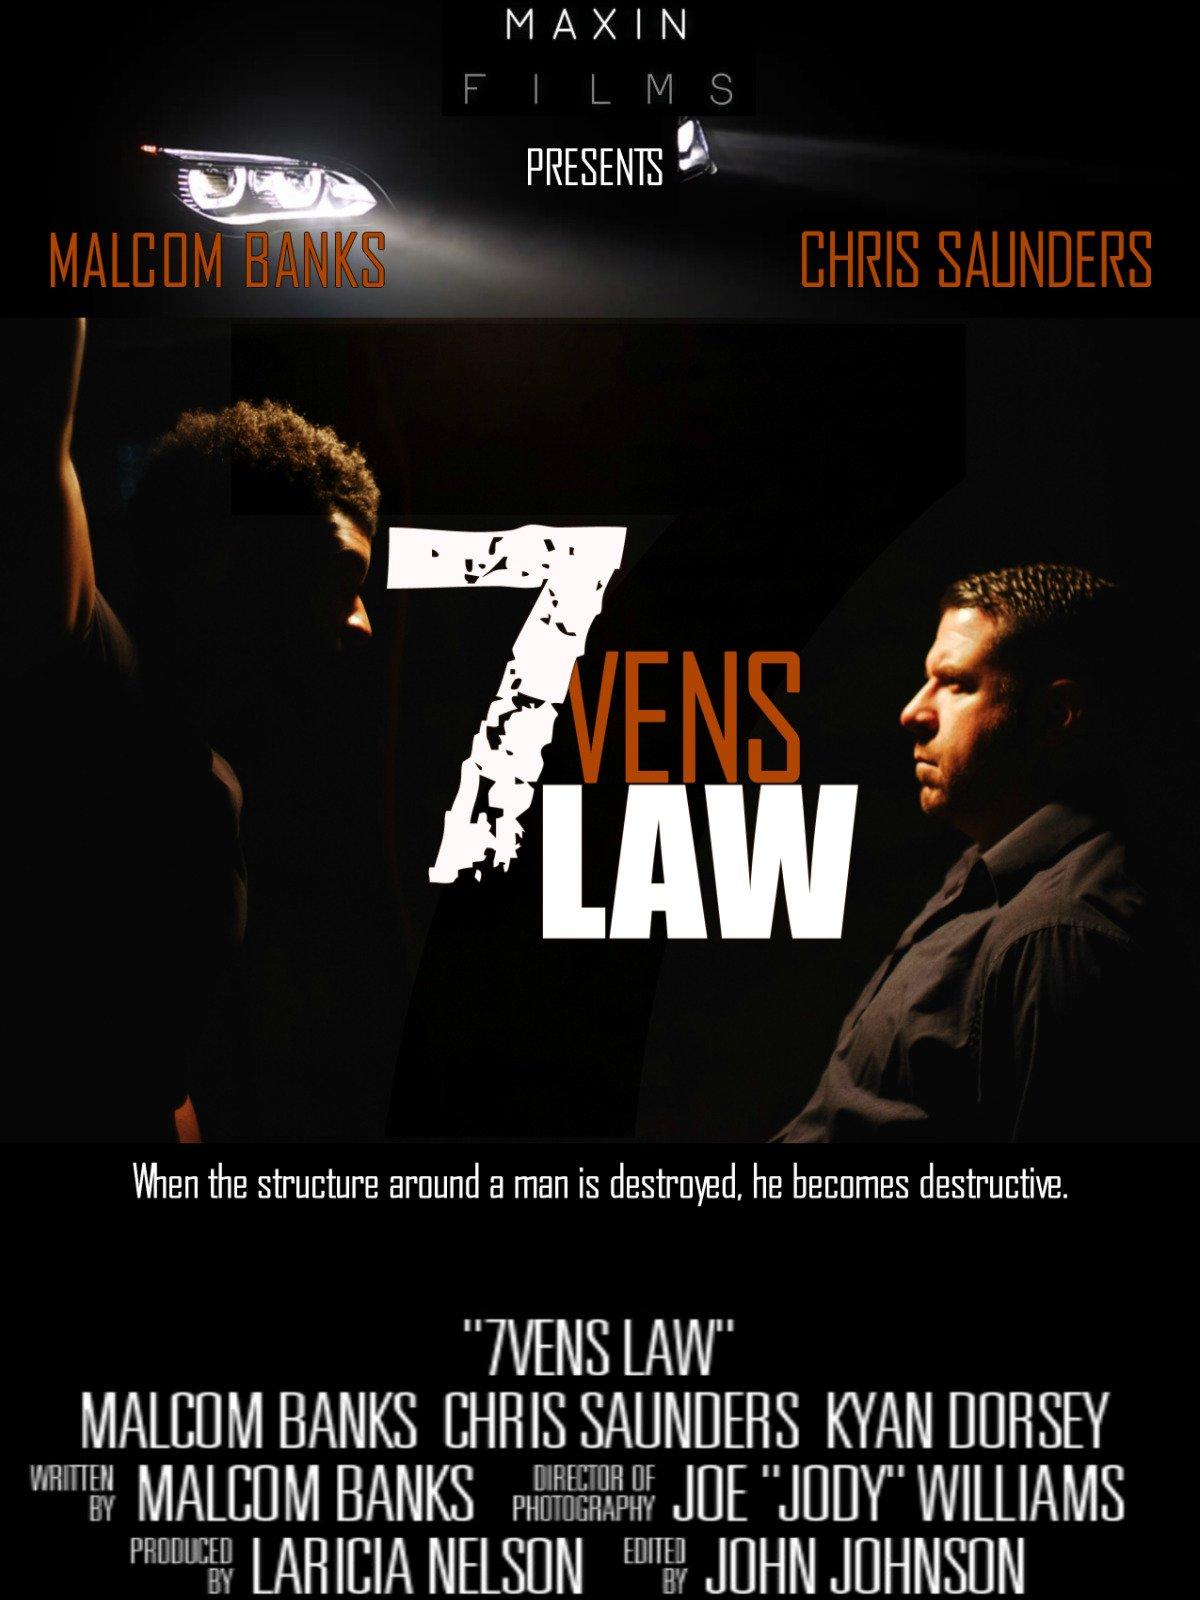 7vens Law